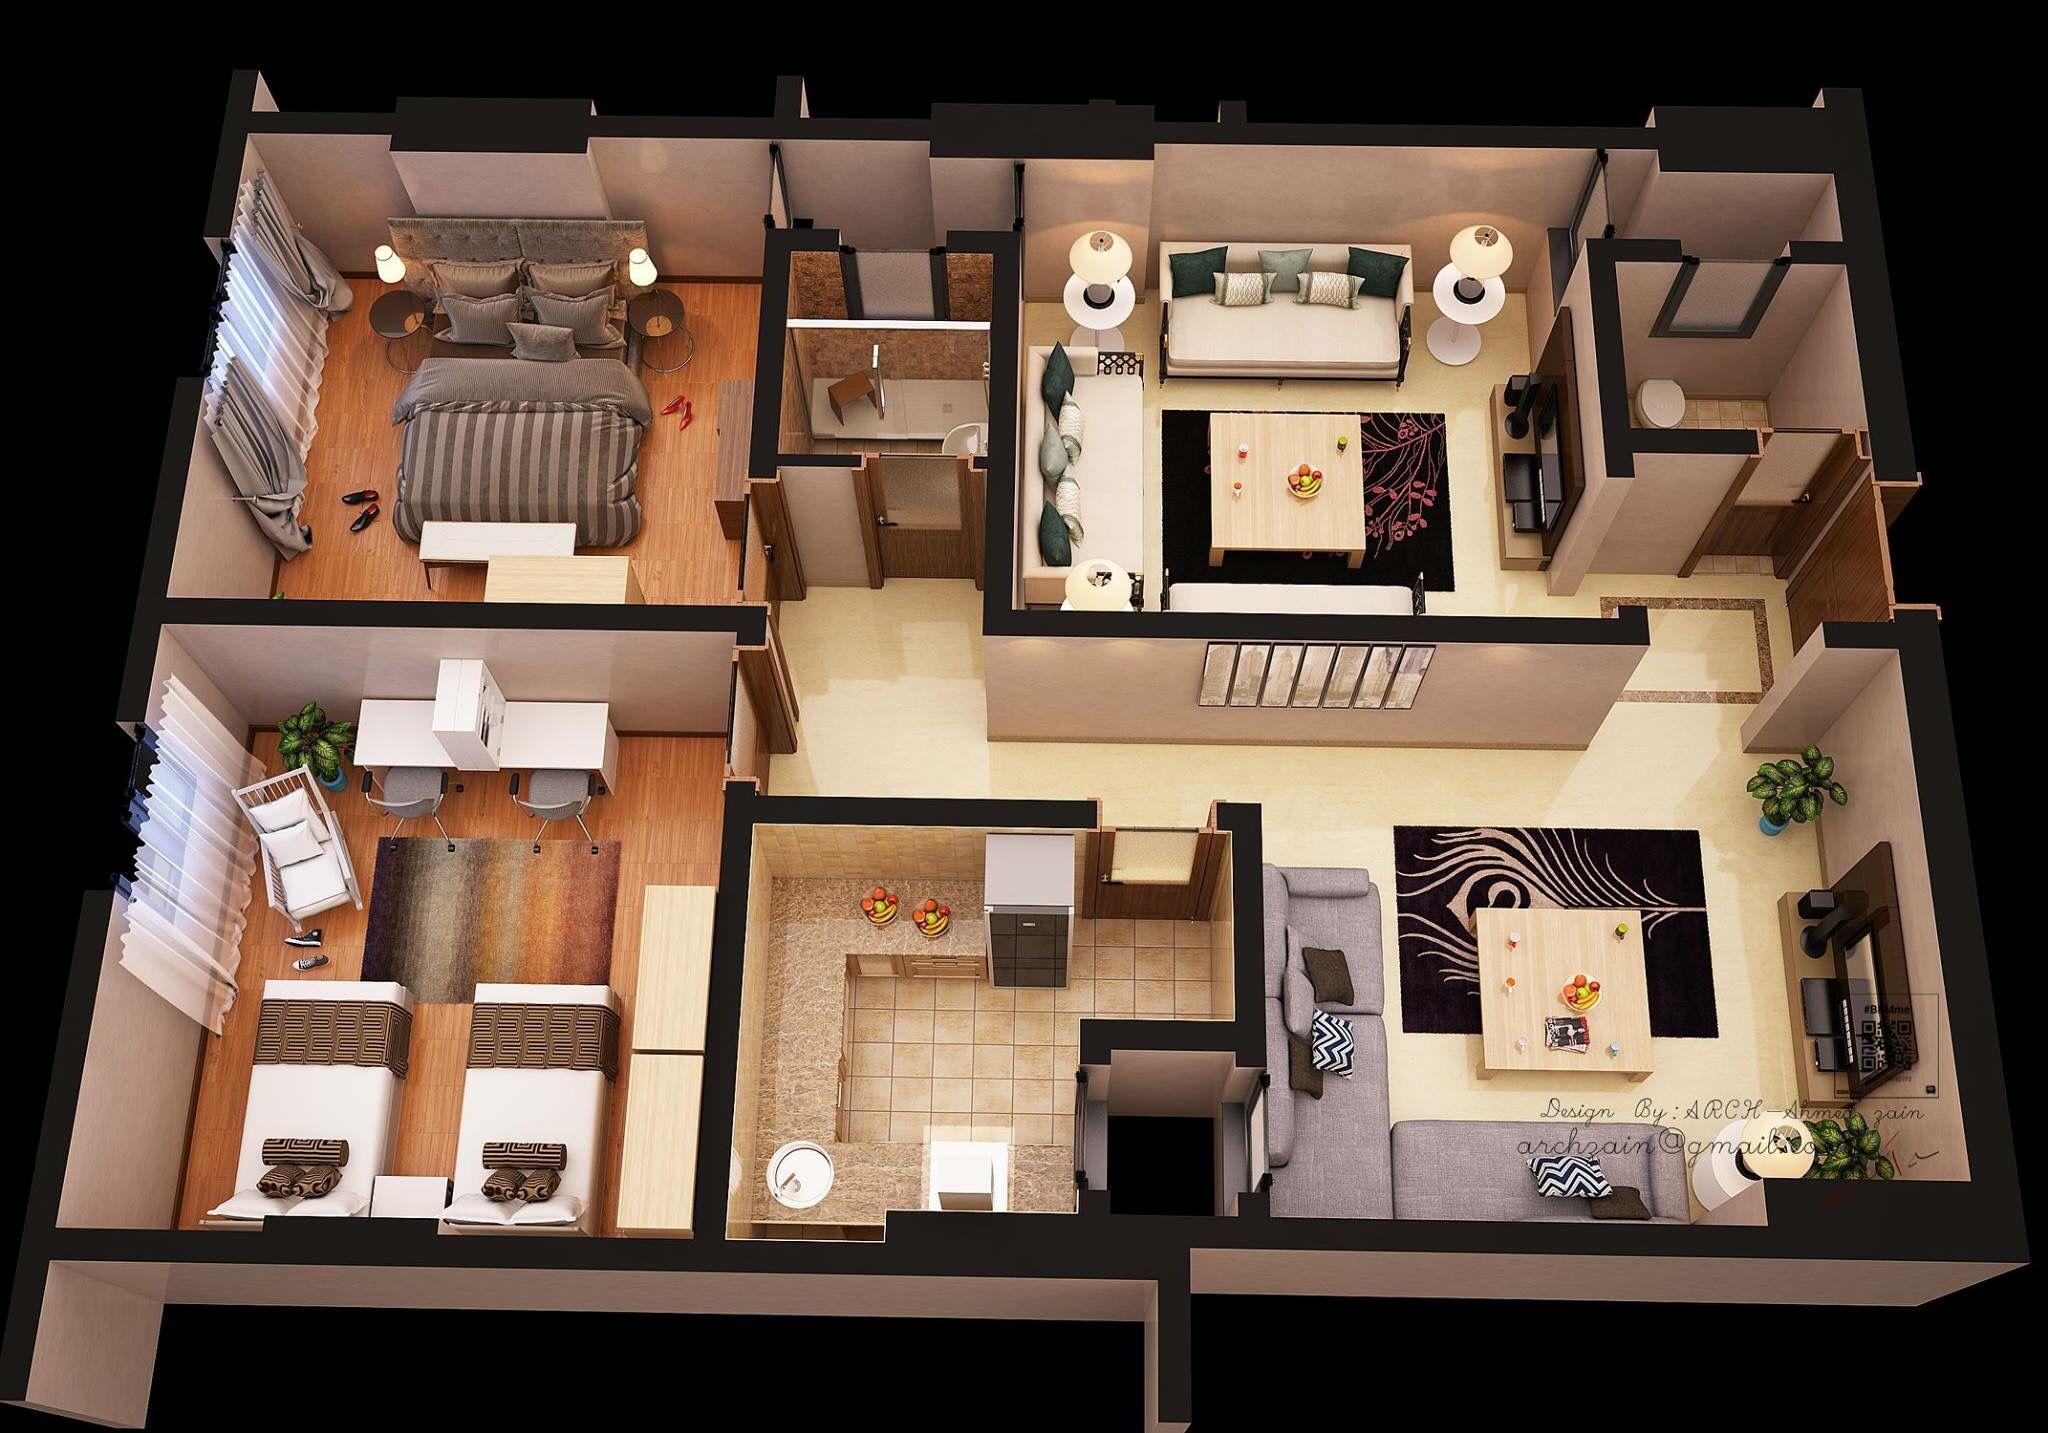 Floor Plans, House Plans, Presentation, Arquitetura, Wireframe, Blueprints  For Homes, House Floor Plans, House Design